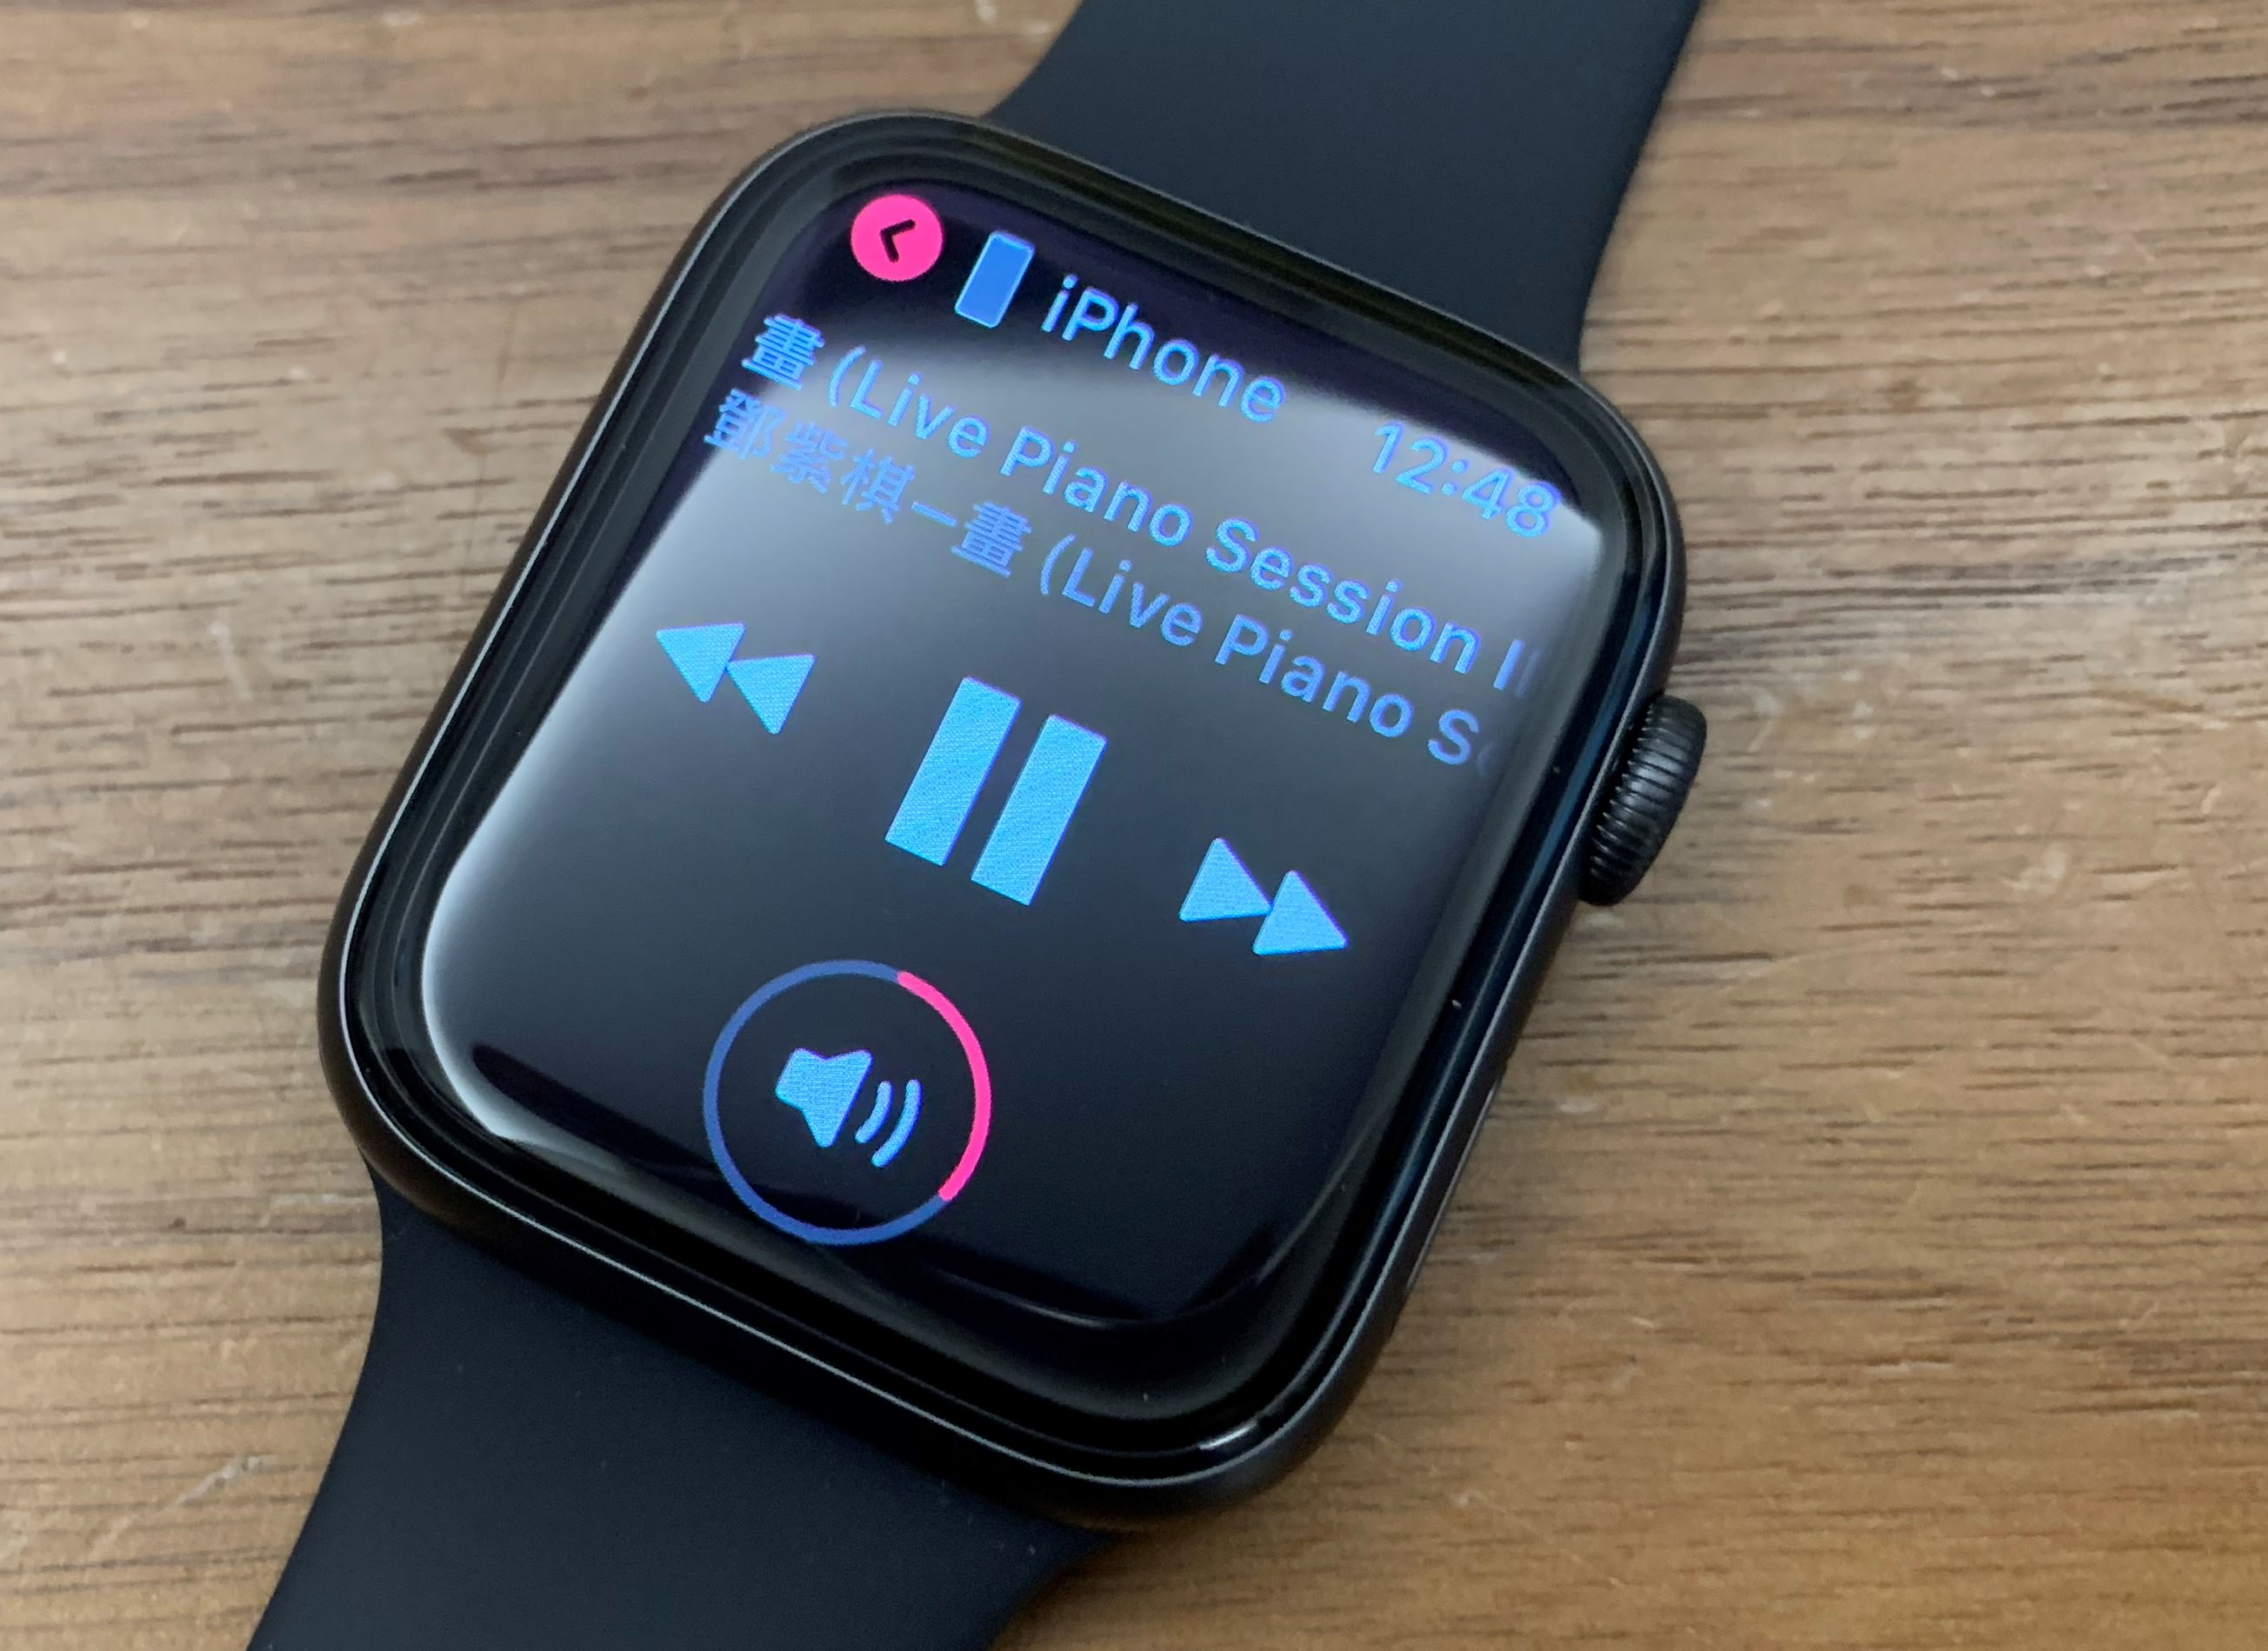 Apple Watch Series 5 LTE版開箱 新舊兩代功能差異與特色看這篇 - 電腦DIY